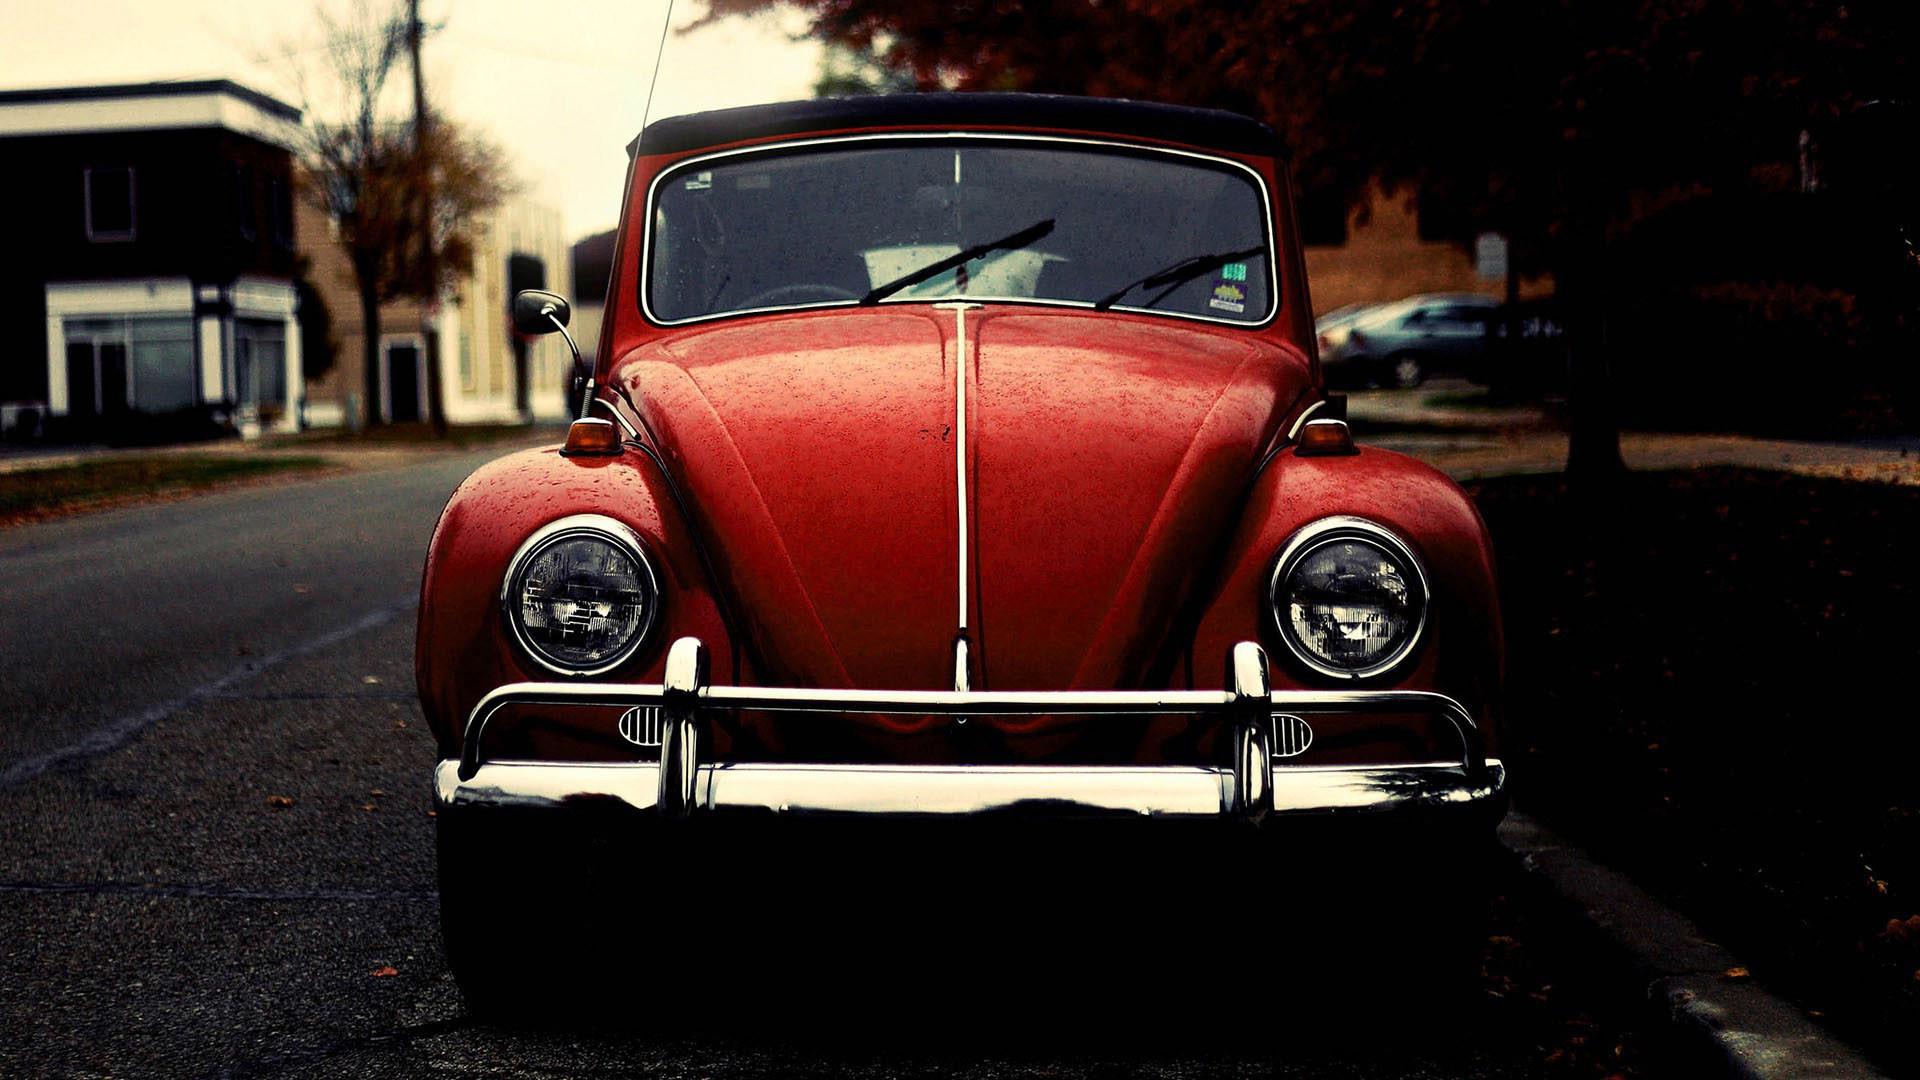 3000x2000 1965 Ford Mustang Classic Car HD Wide Wallpaper For 4K UHD  Widescreen Desktop U0026 Smartphone